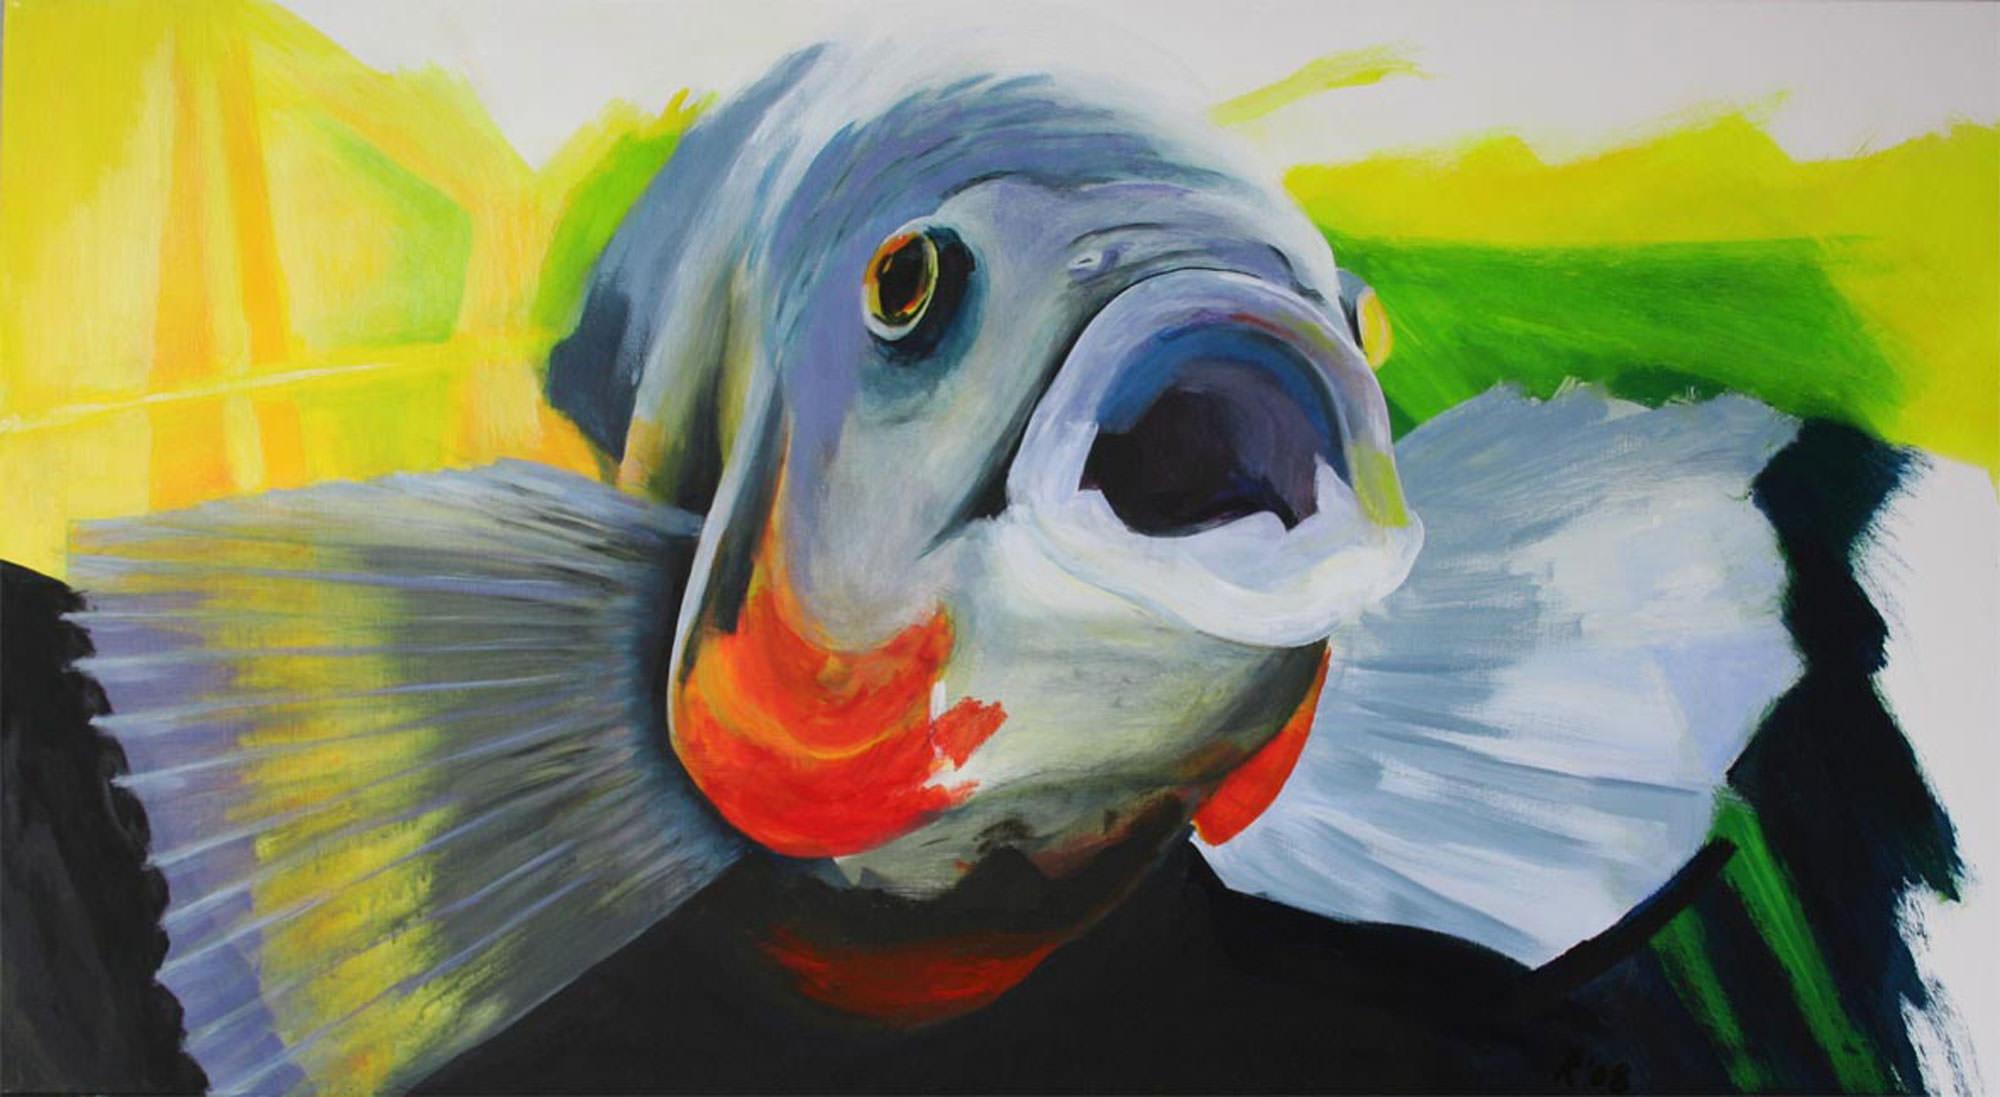 Oscarfisch